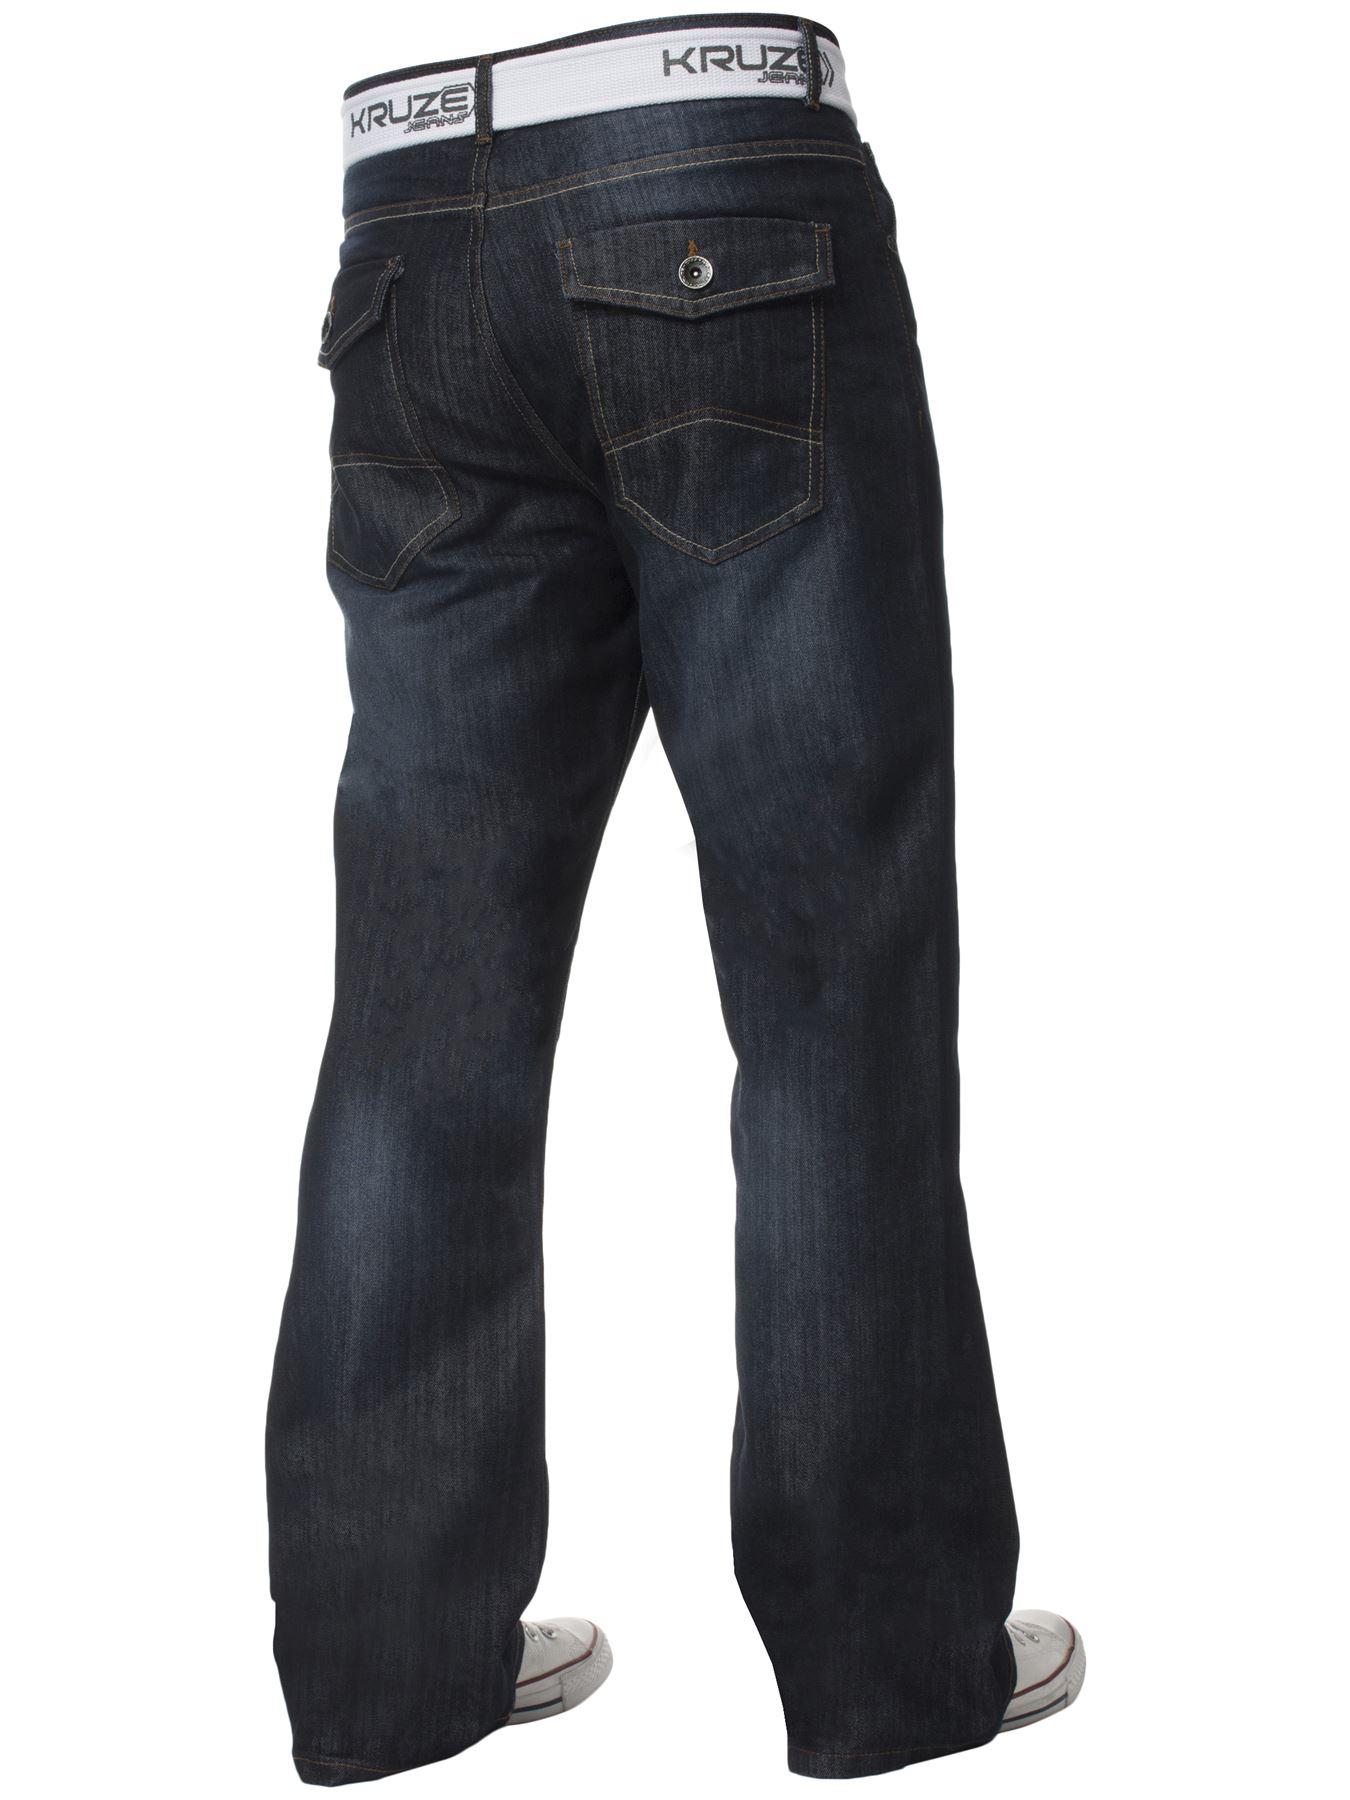 Kruze Jeans Neuf pour Hommes Bootcut Jambe Large Pantalon Evasé King Grande Tout